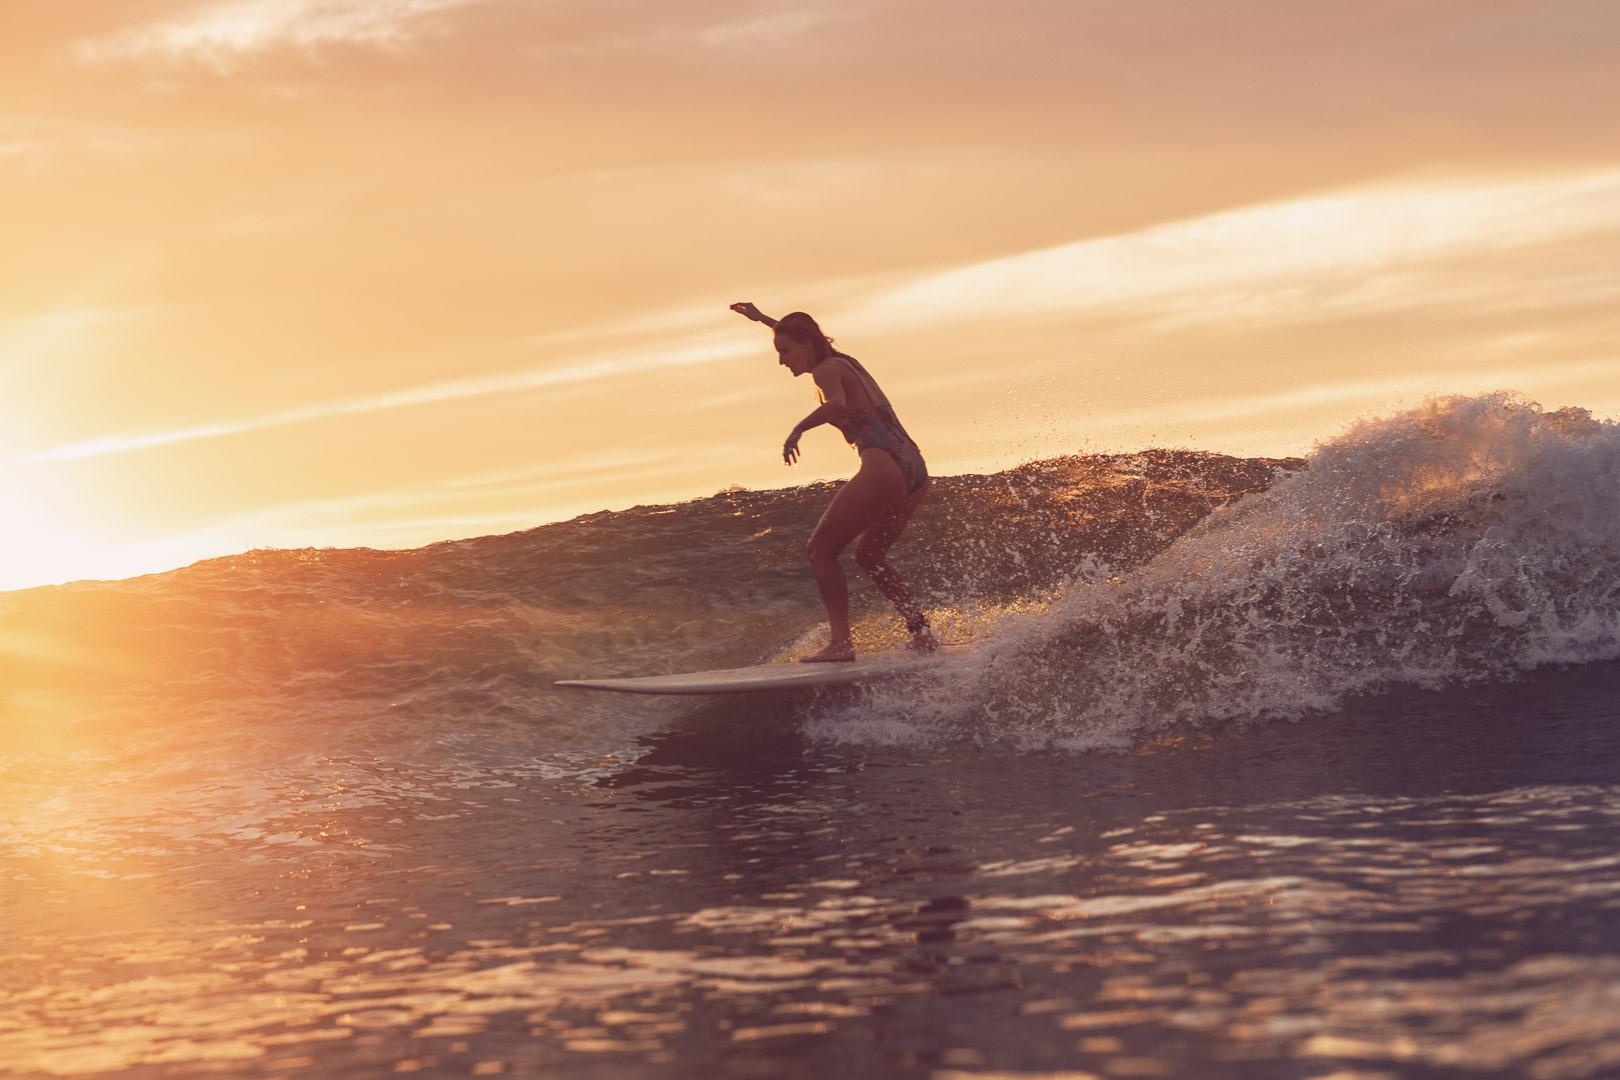 Surfgirl-mxmsurfphoto-Morgan20180508-686-Edit.jpg